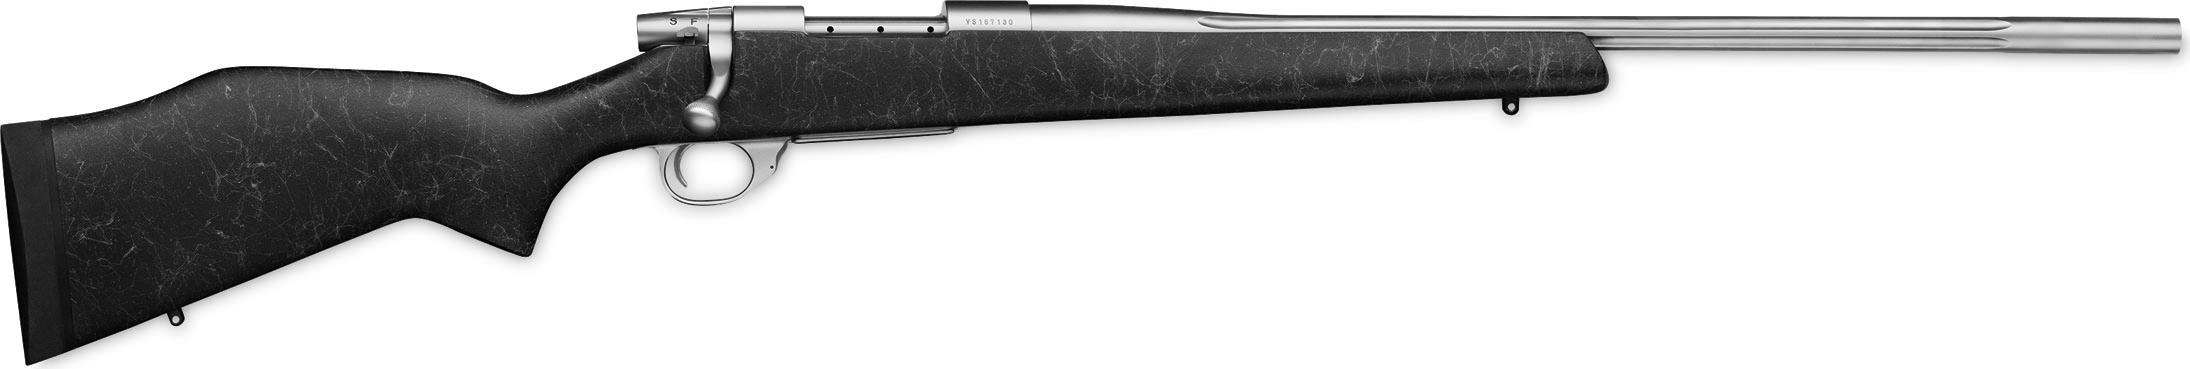 Vanguard Back Country Custom